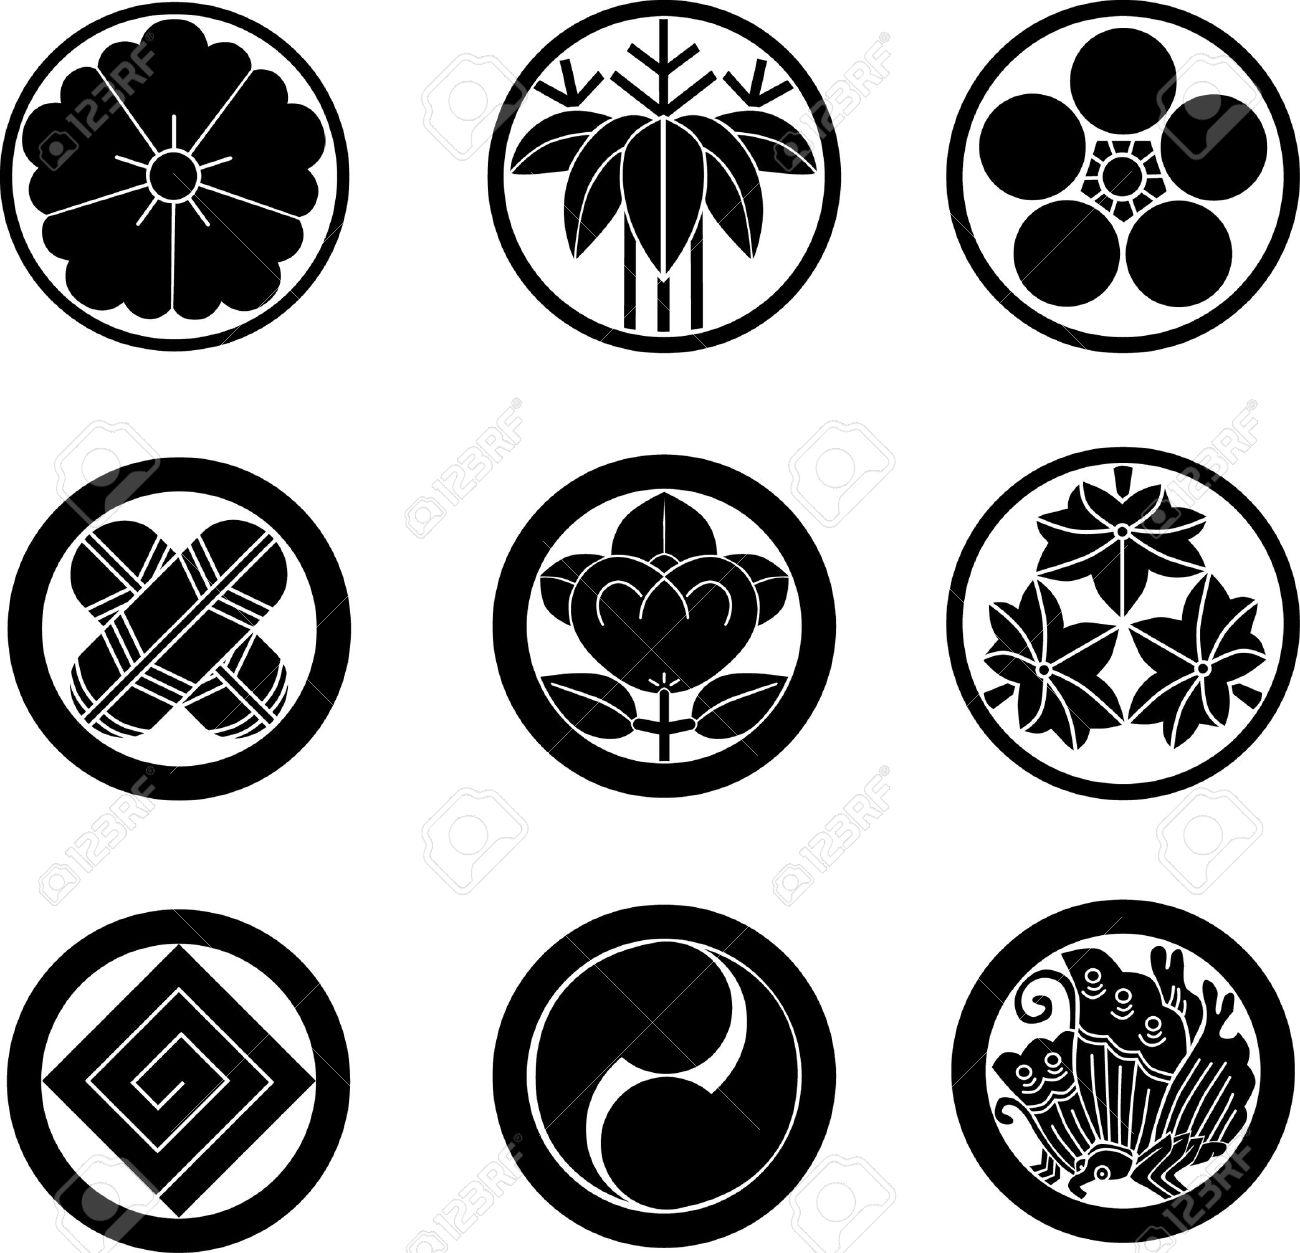 Japanese family crests royalty free cliparts vectors and stock japanese family crests stock vector 8817989 buycottarizona